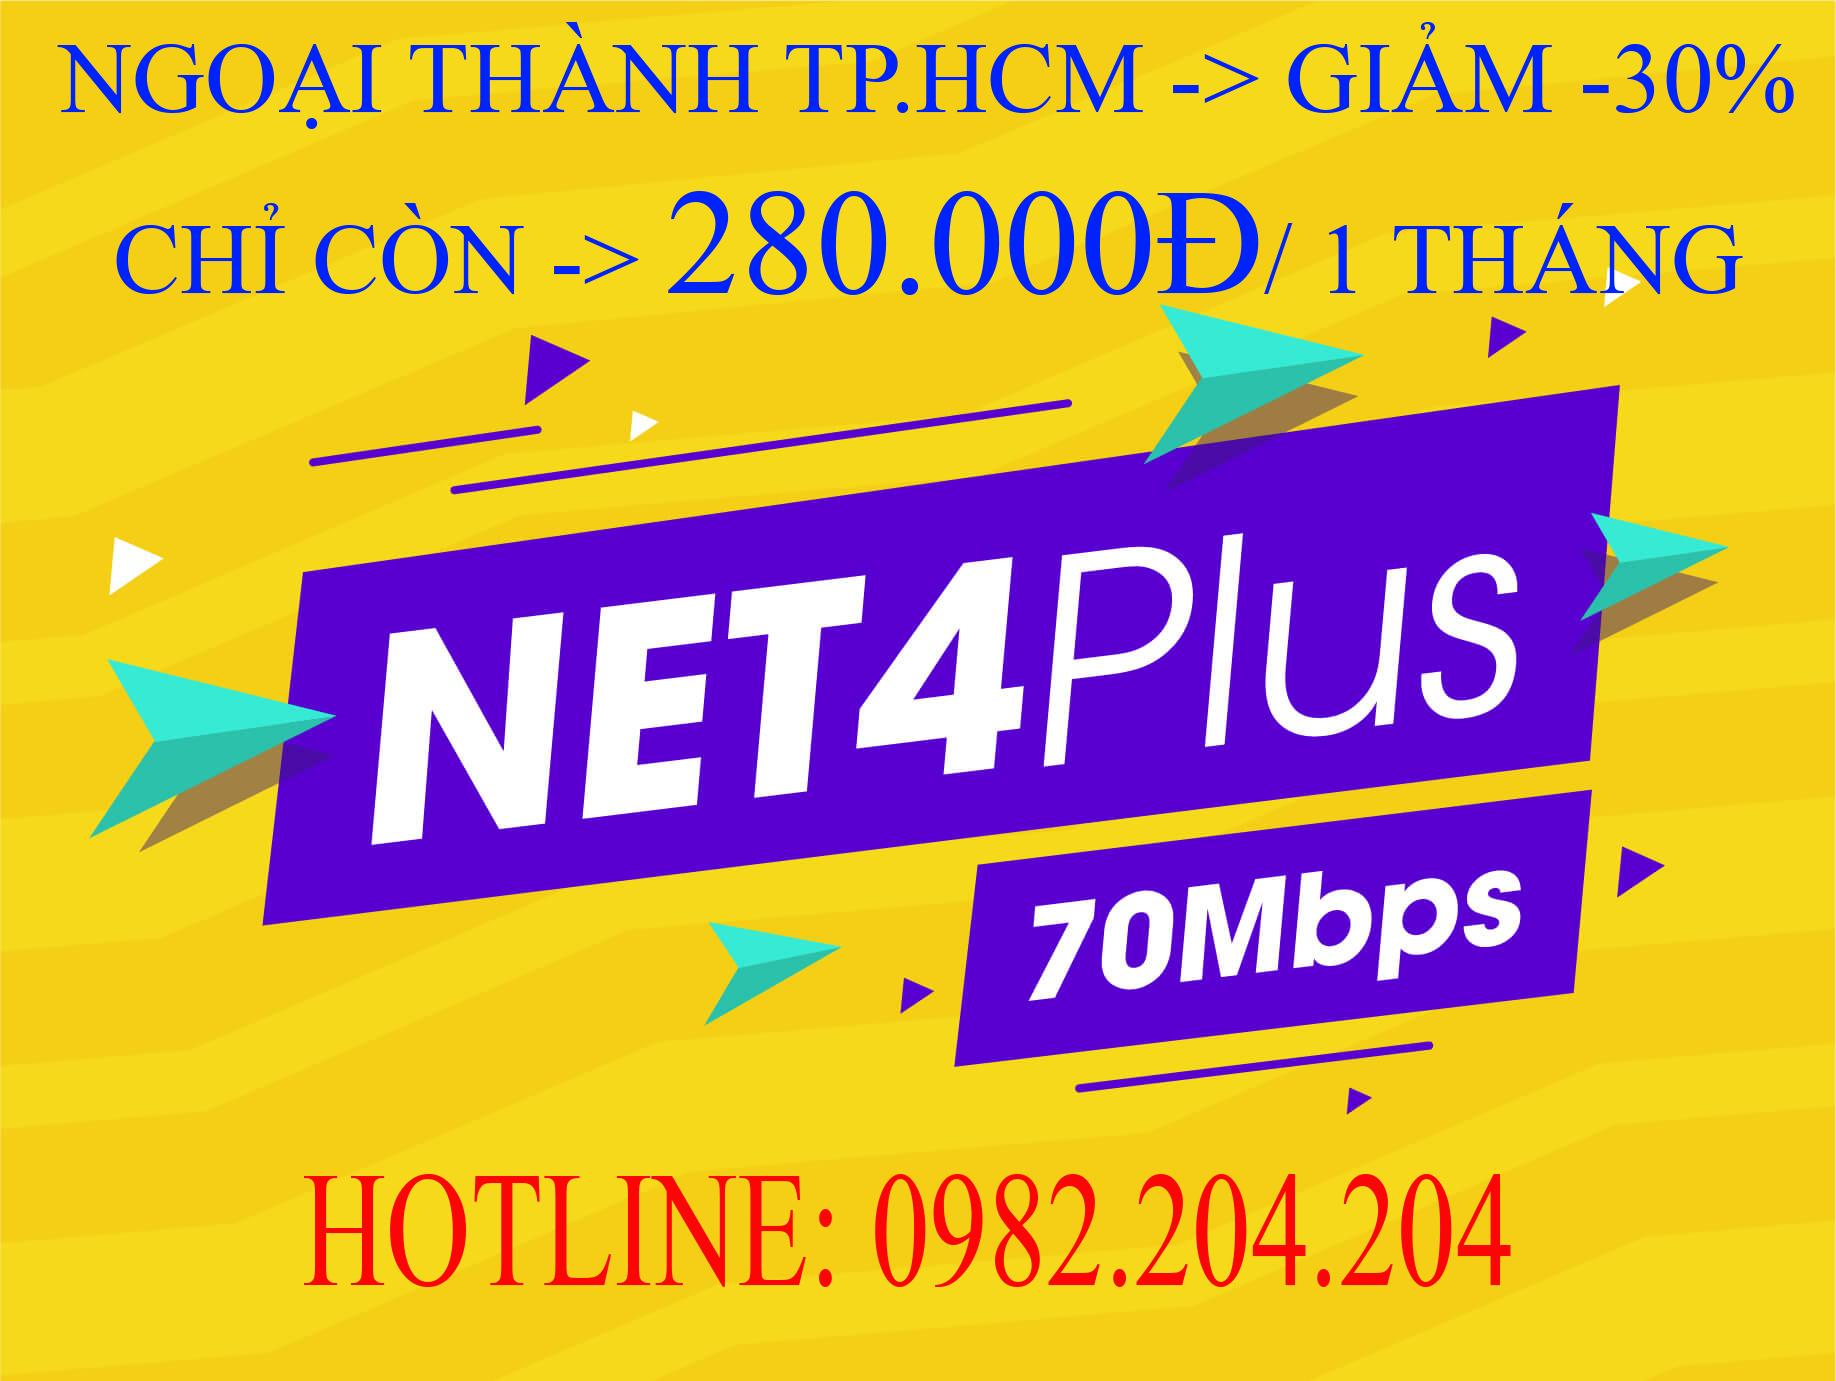 Lắp Wifi Giá Rẻ TPHCM Gói Net 4 plus Viettel 70 Mbps